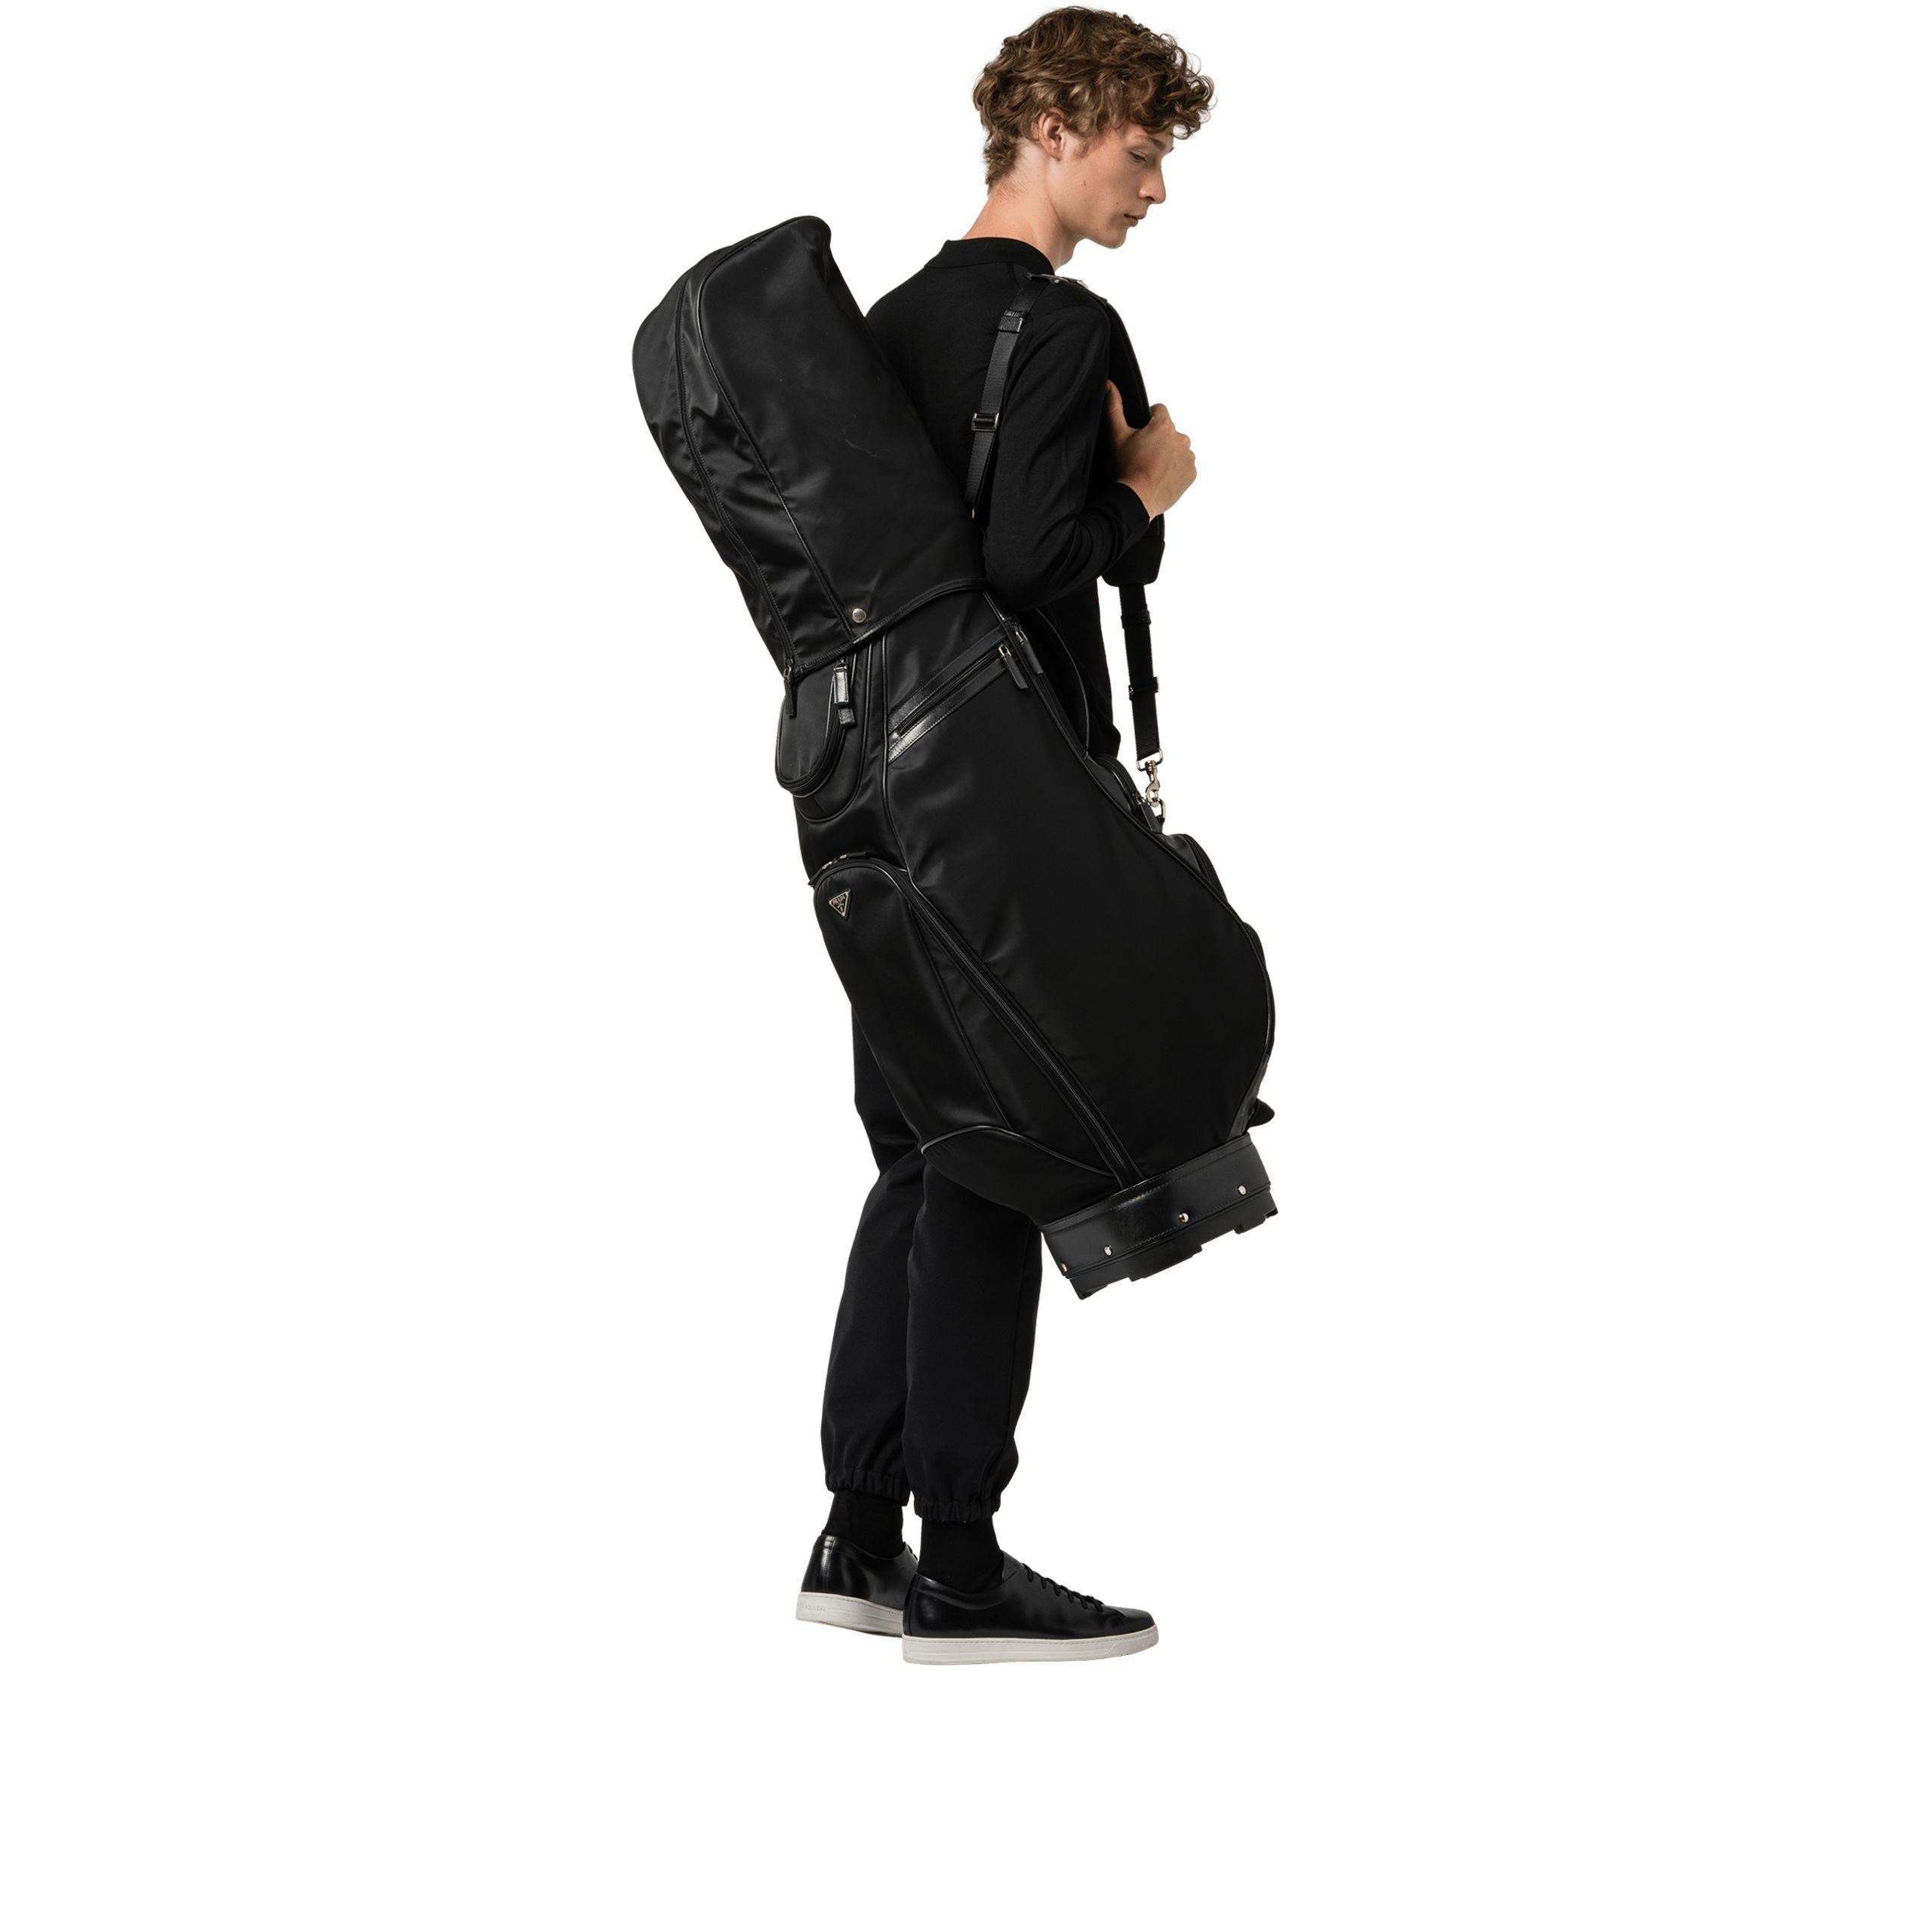 6c1d6ab5c33d Lyst - Prada Techical Fabric Golf Bag in Black for Men